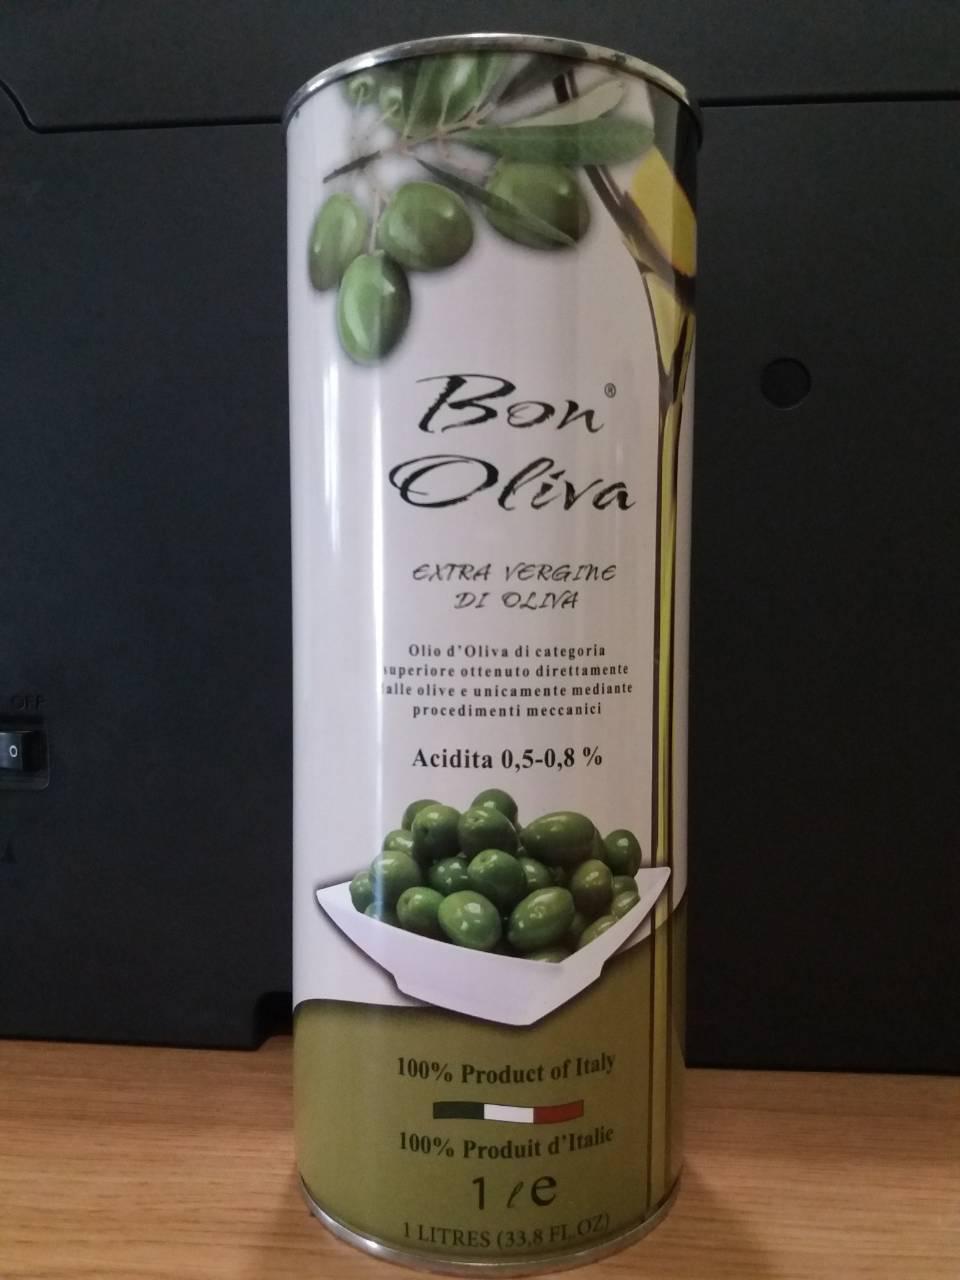 Оливковое масло Bon Oliva Extra Vergine Di Oliva 1 л